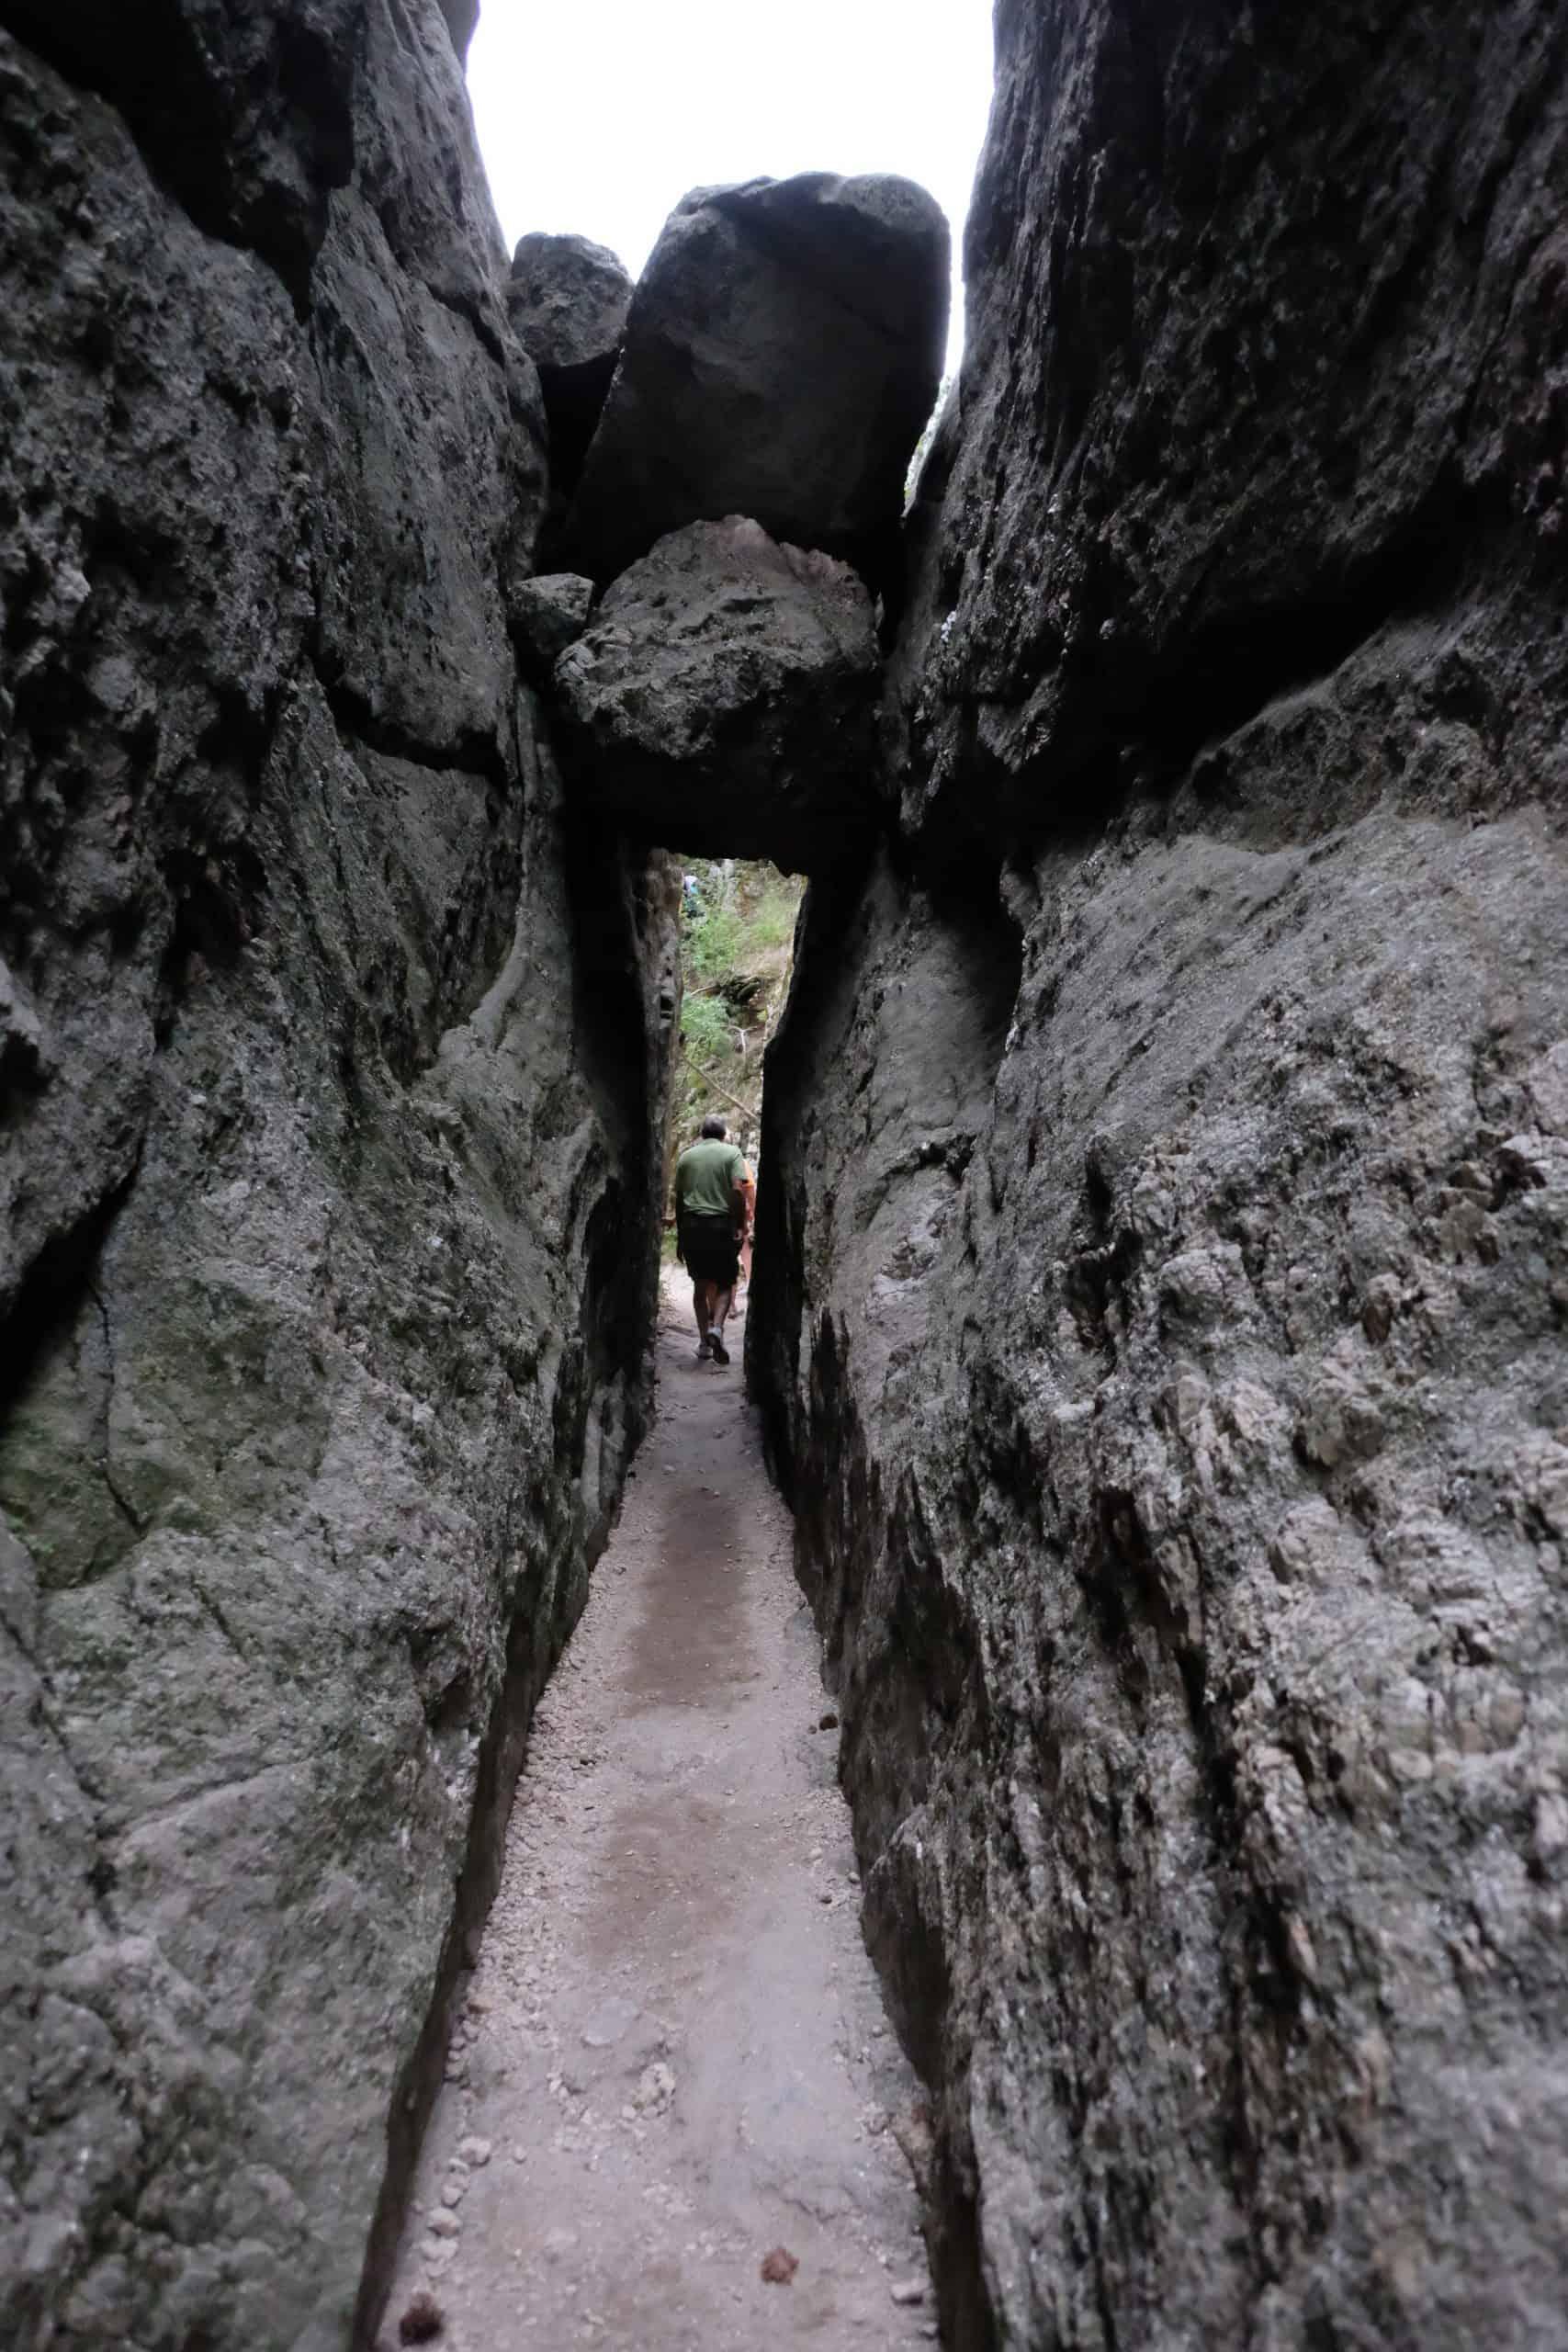 Sunday Gulch Trail